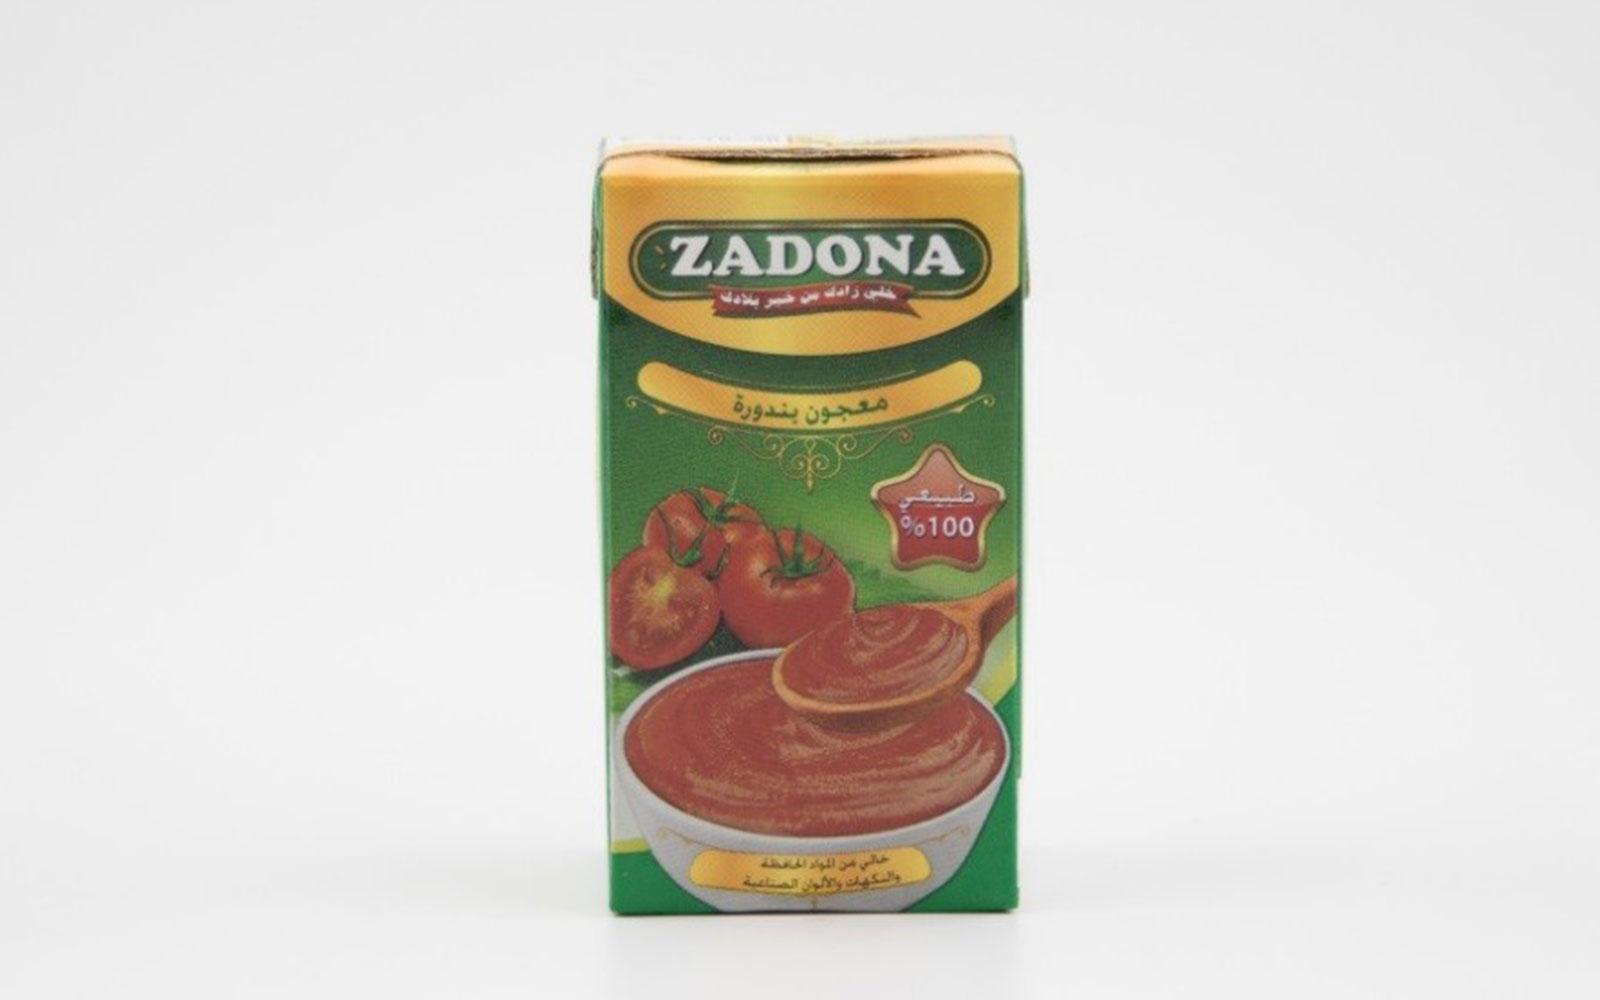 Zadona Tomato Paste